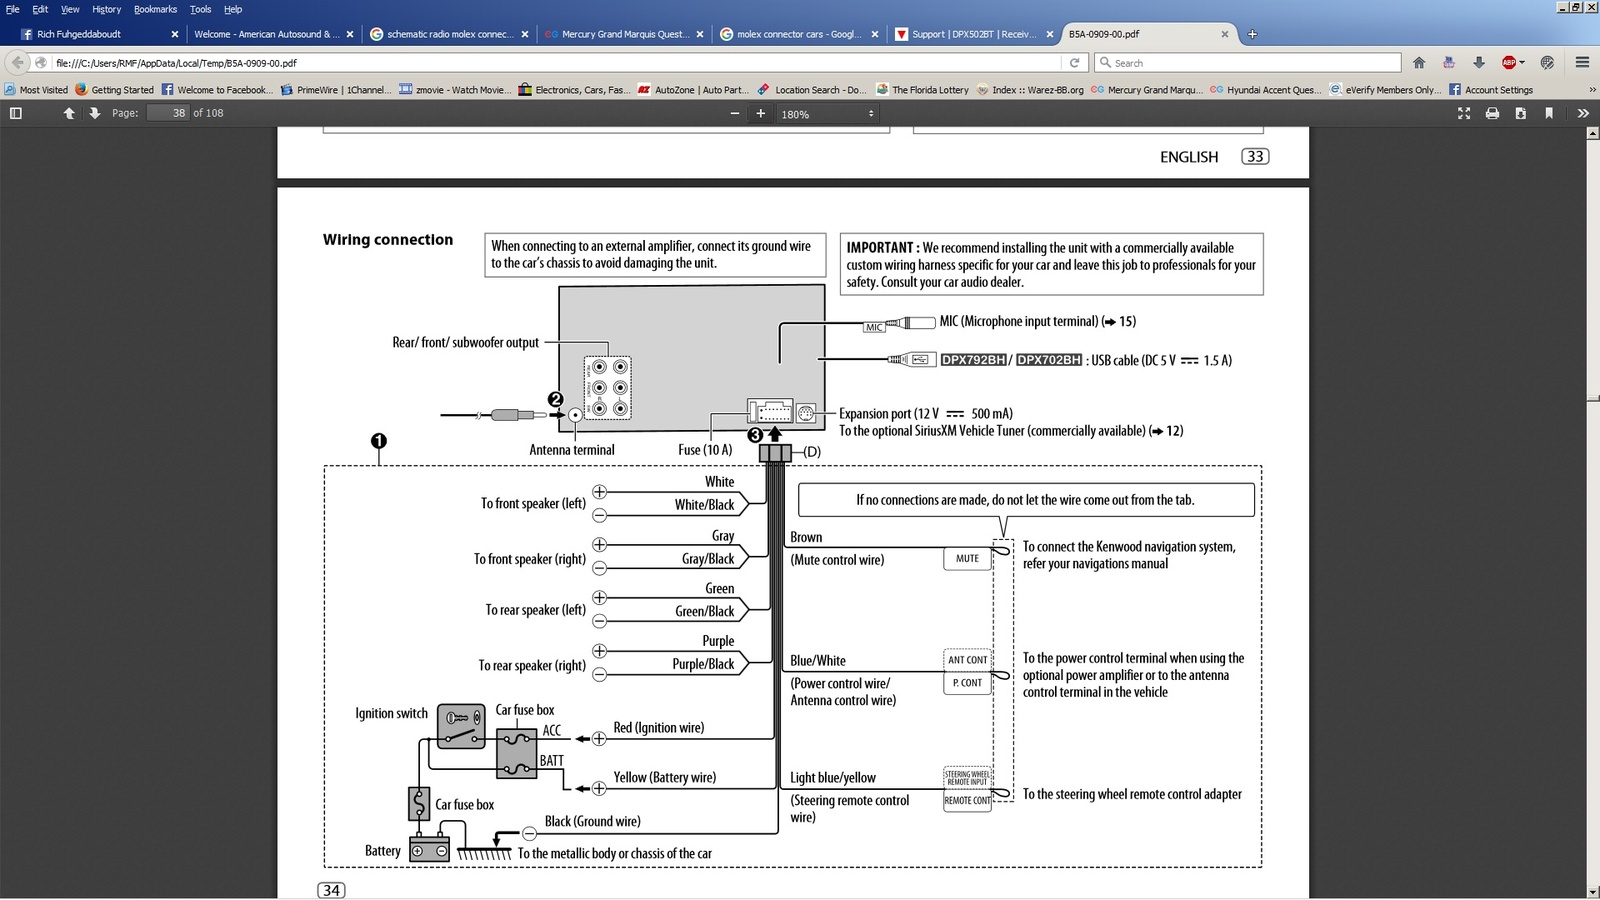 40 Mercury Grand Marquis Wiring   discus expectat My Wiring ...